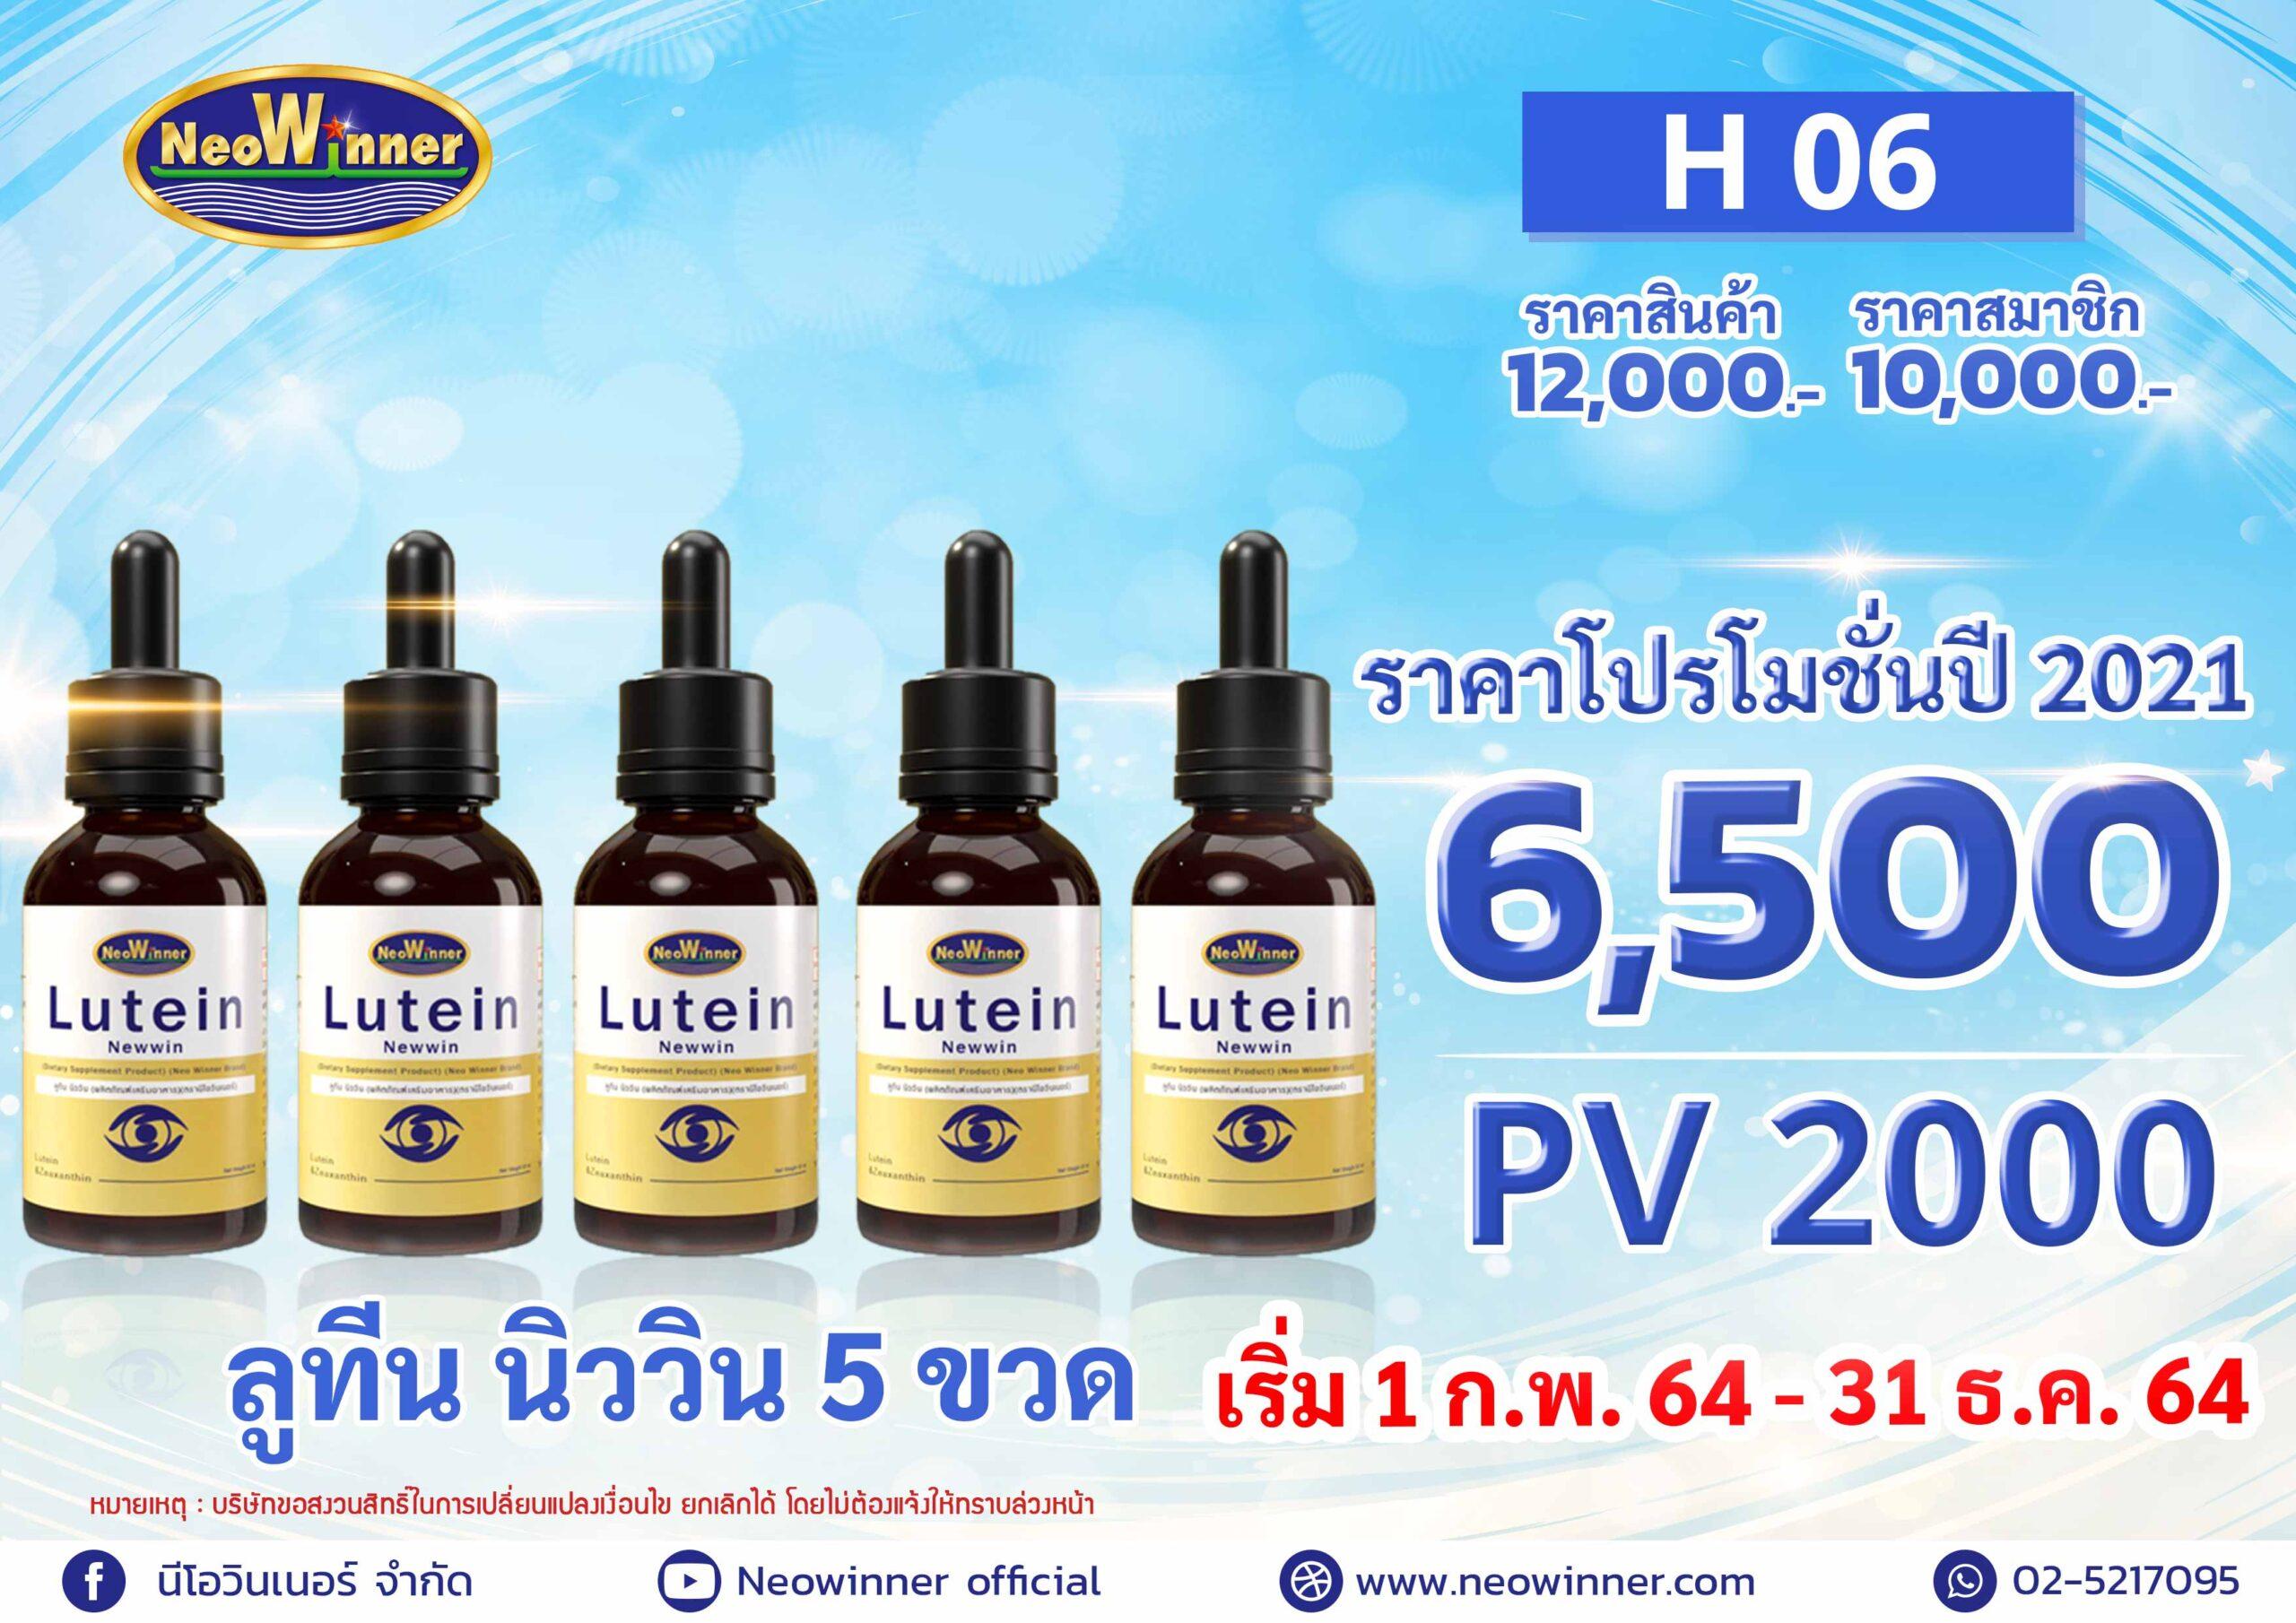 Promotion-H-06-2021